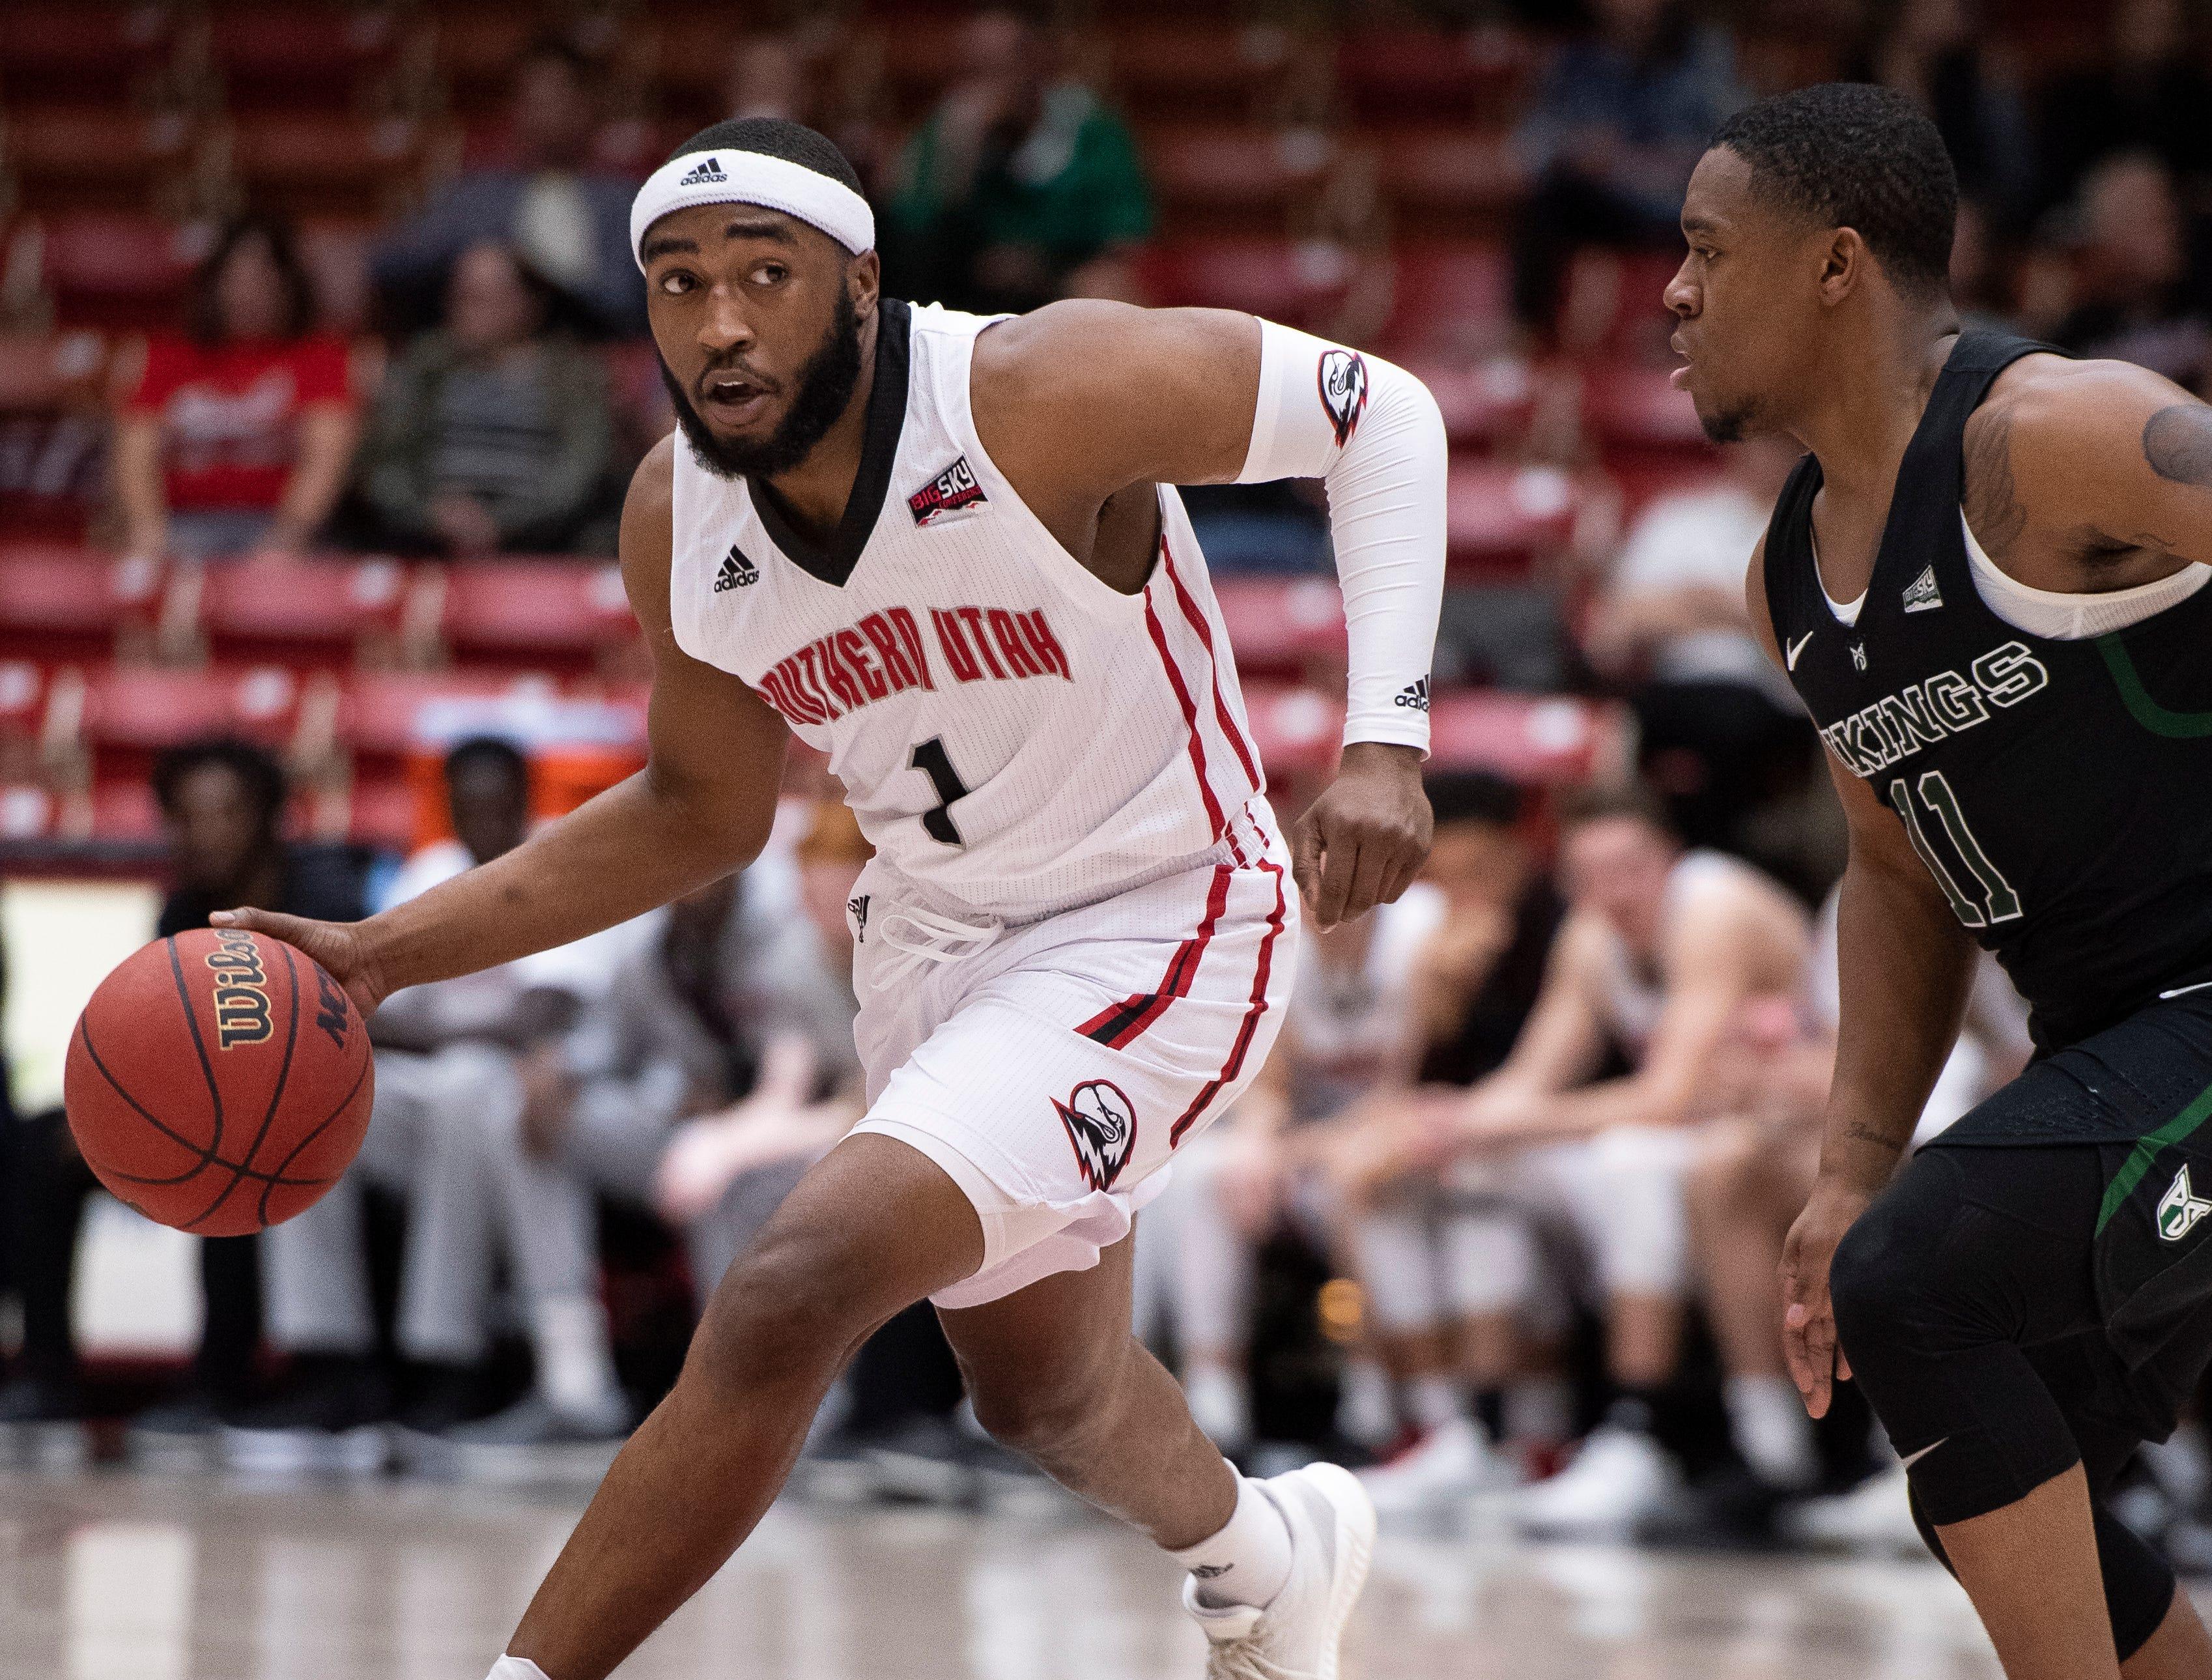 Southern Utah University freshman Kenton Eskridge (1) moves the ball against Portland State in the America First Event Center Thursday, January 17, 2019. SUU won, 83-69.